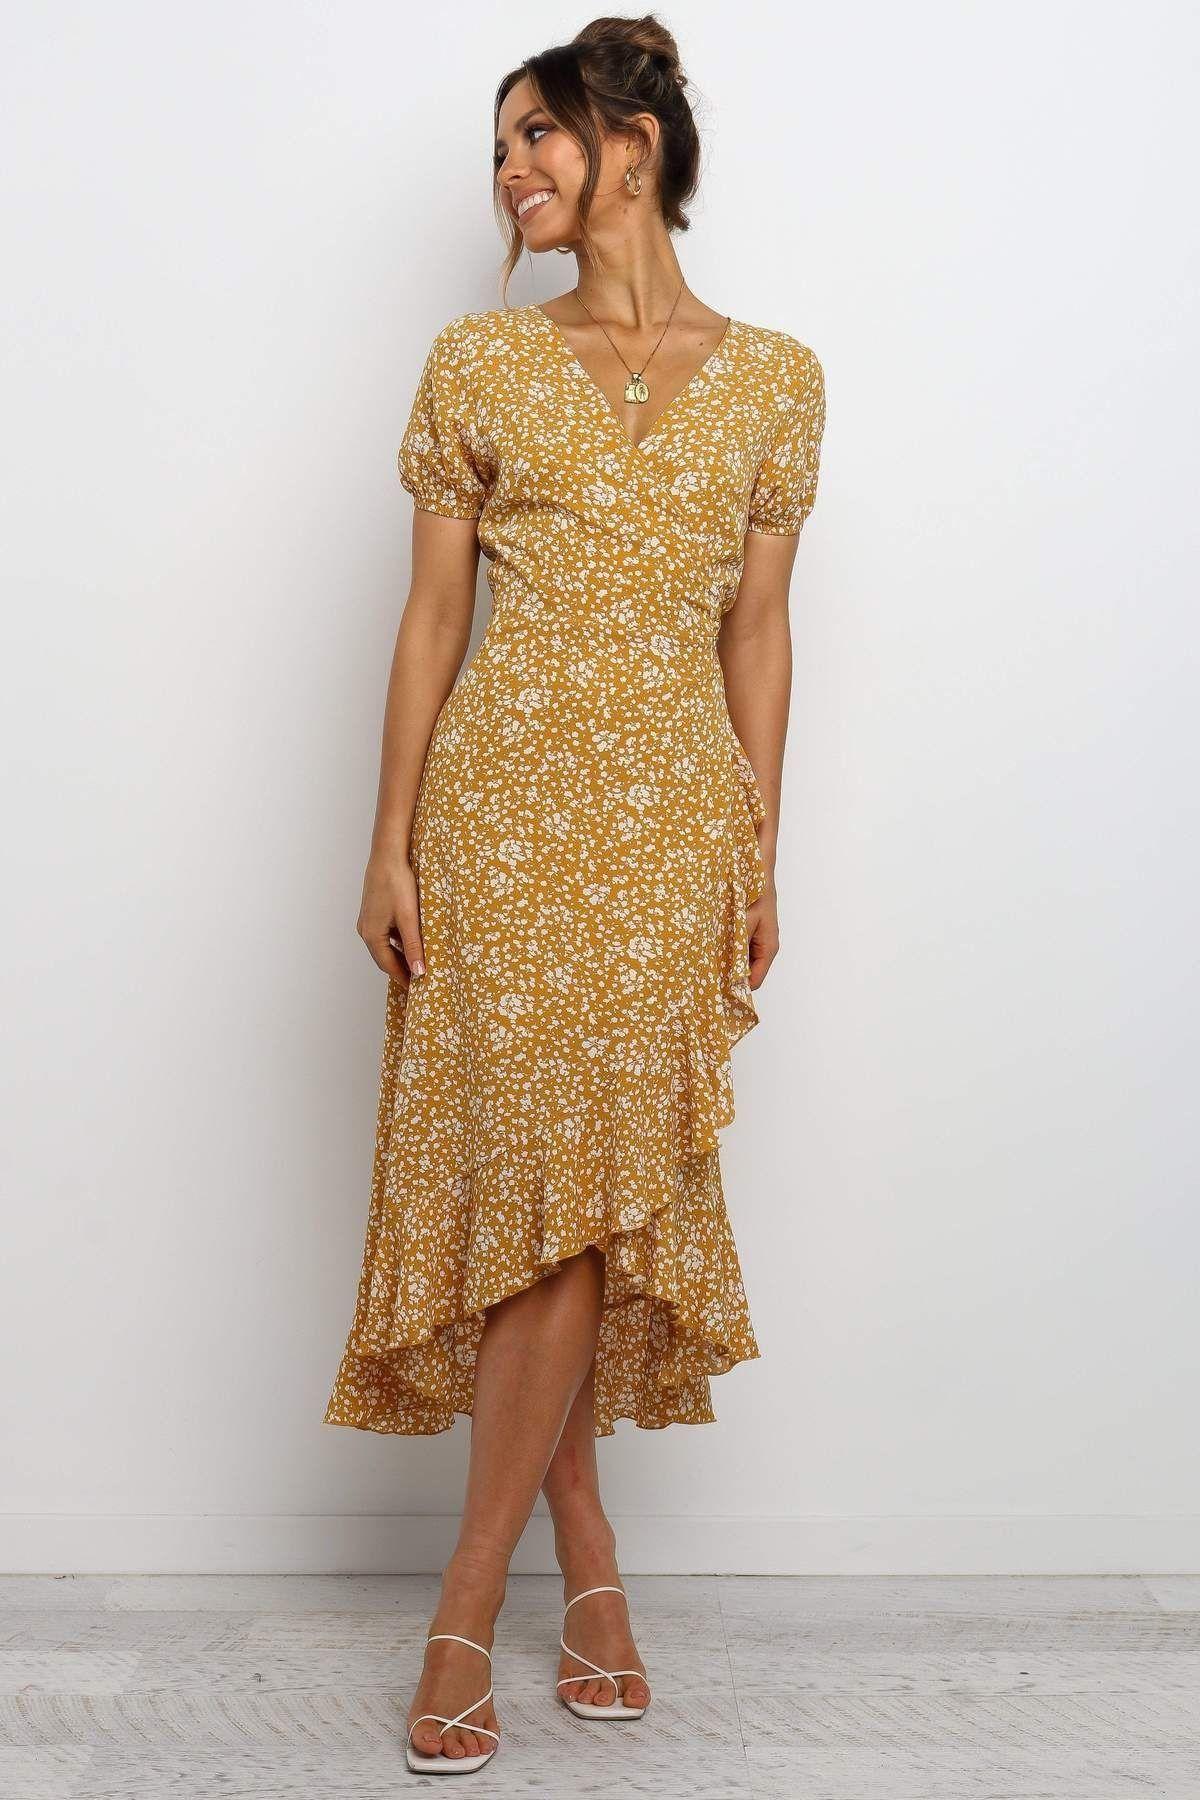 Nalyhn Dress Mustard 1000 Knee Length Dresses Casual Knee Length Dresses Dresses [ 1800 x 1200 Pixel ]